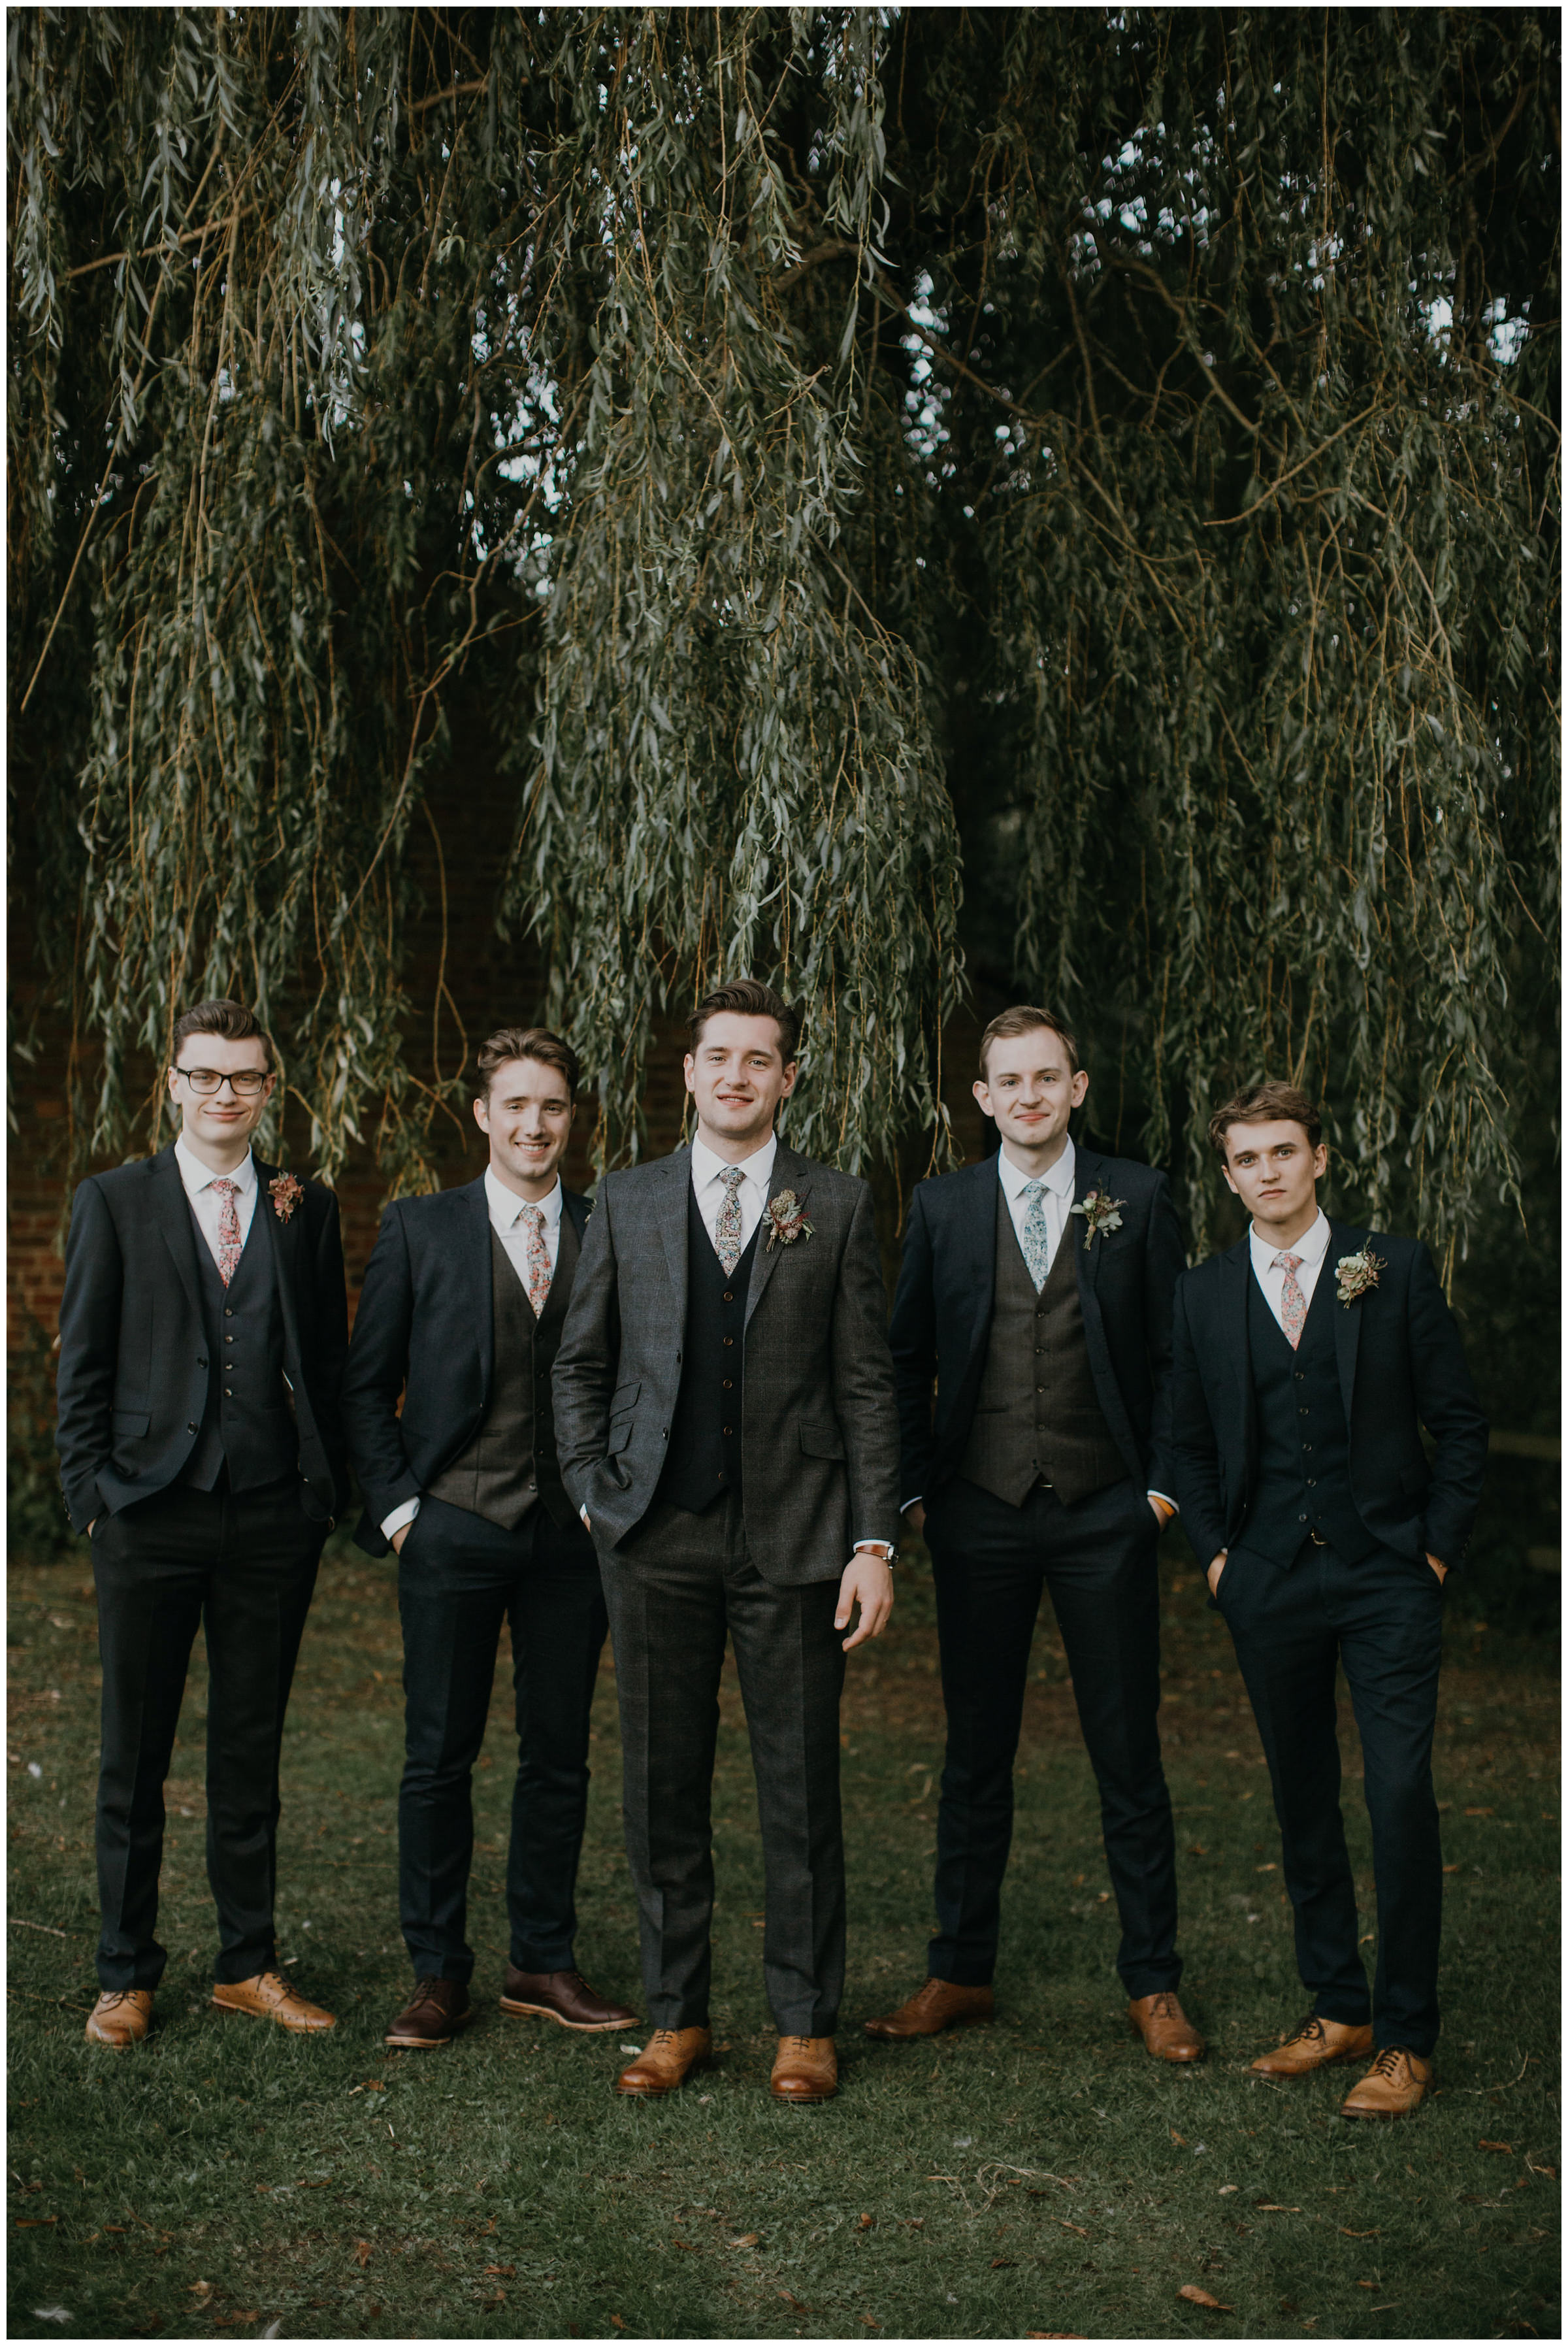 groomsmen fashion tweed suits